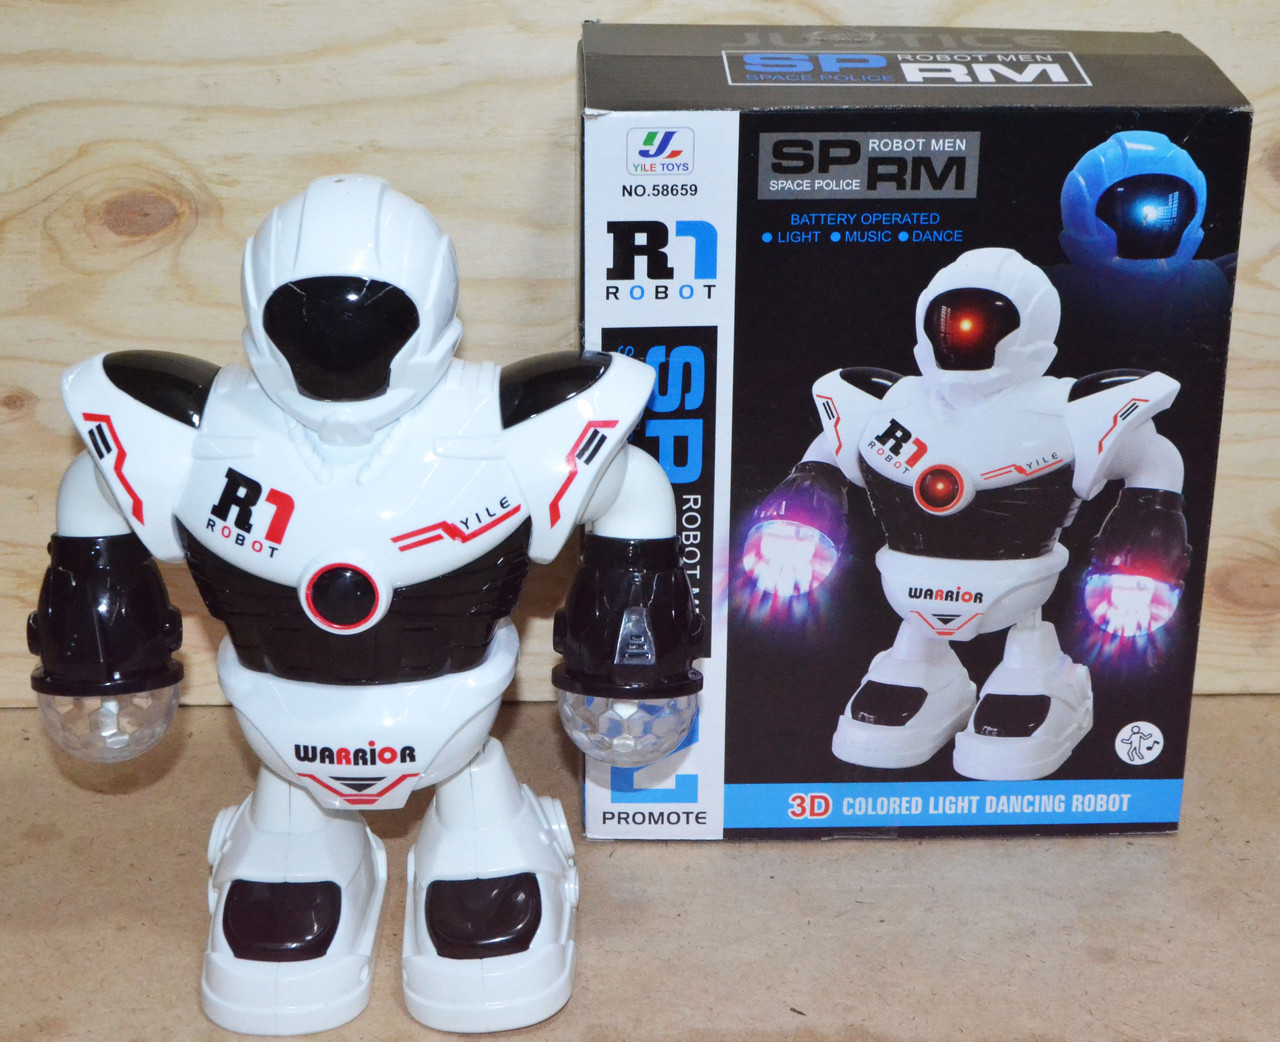 58659 Robot Space Police (музыка,свет,движение) 20*25см